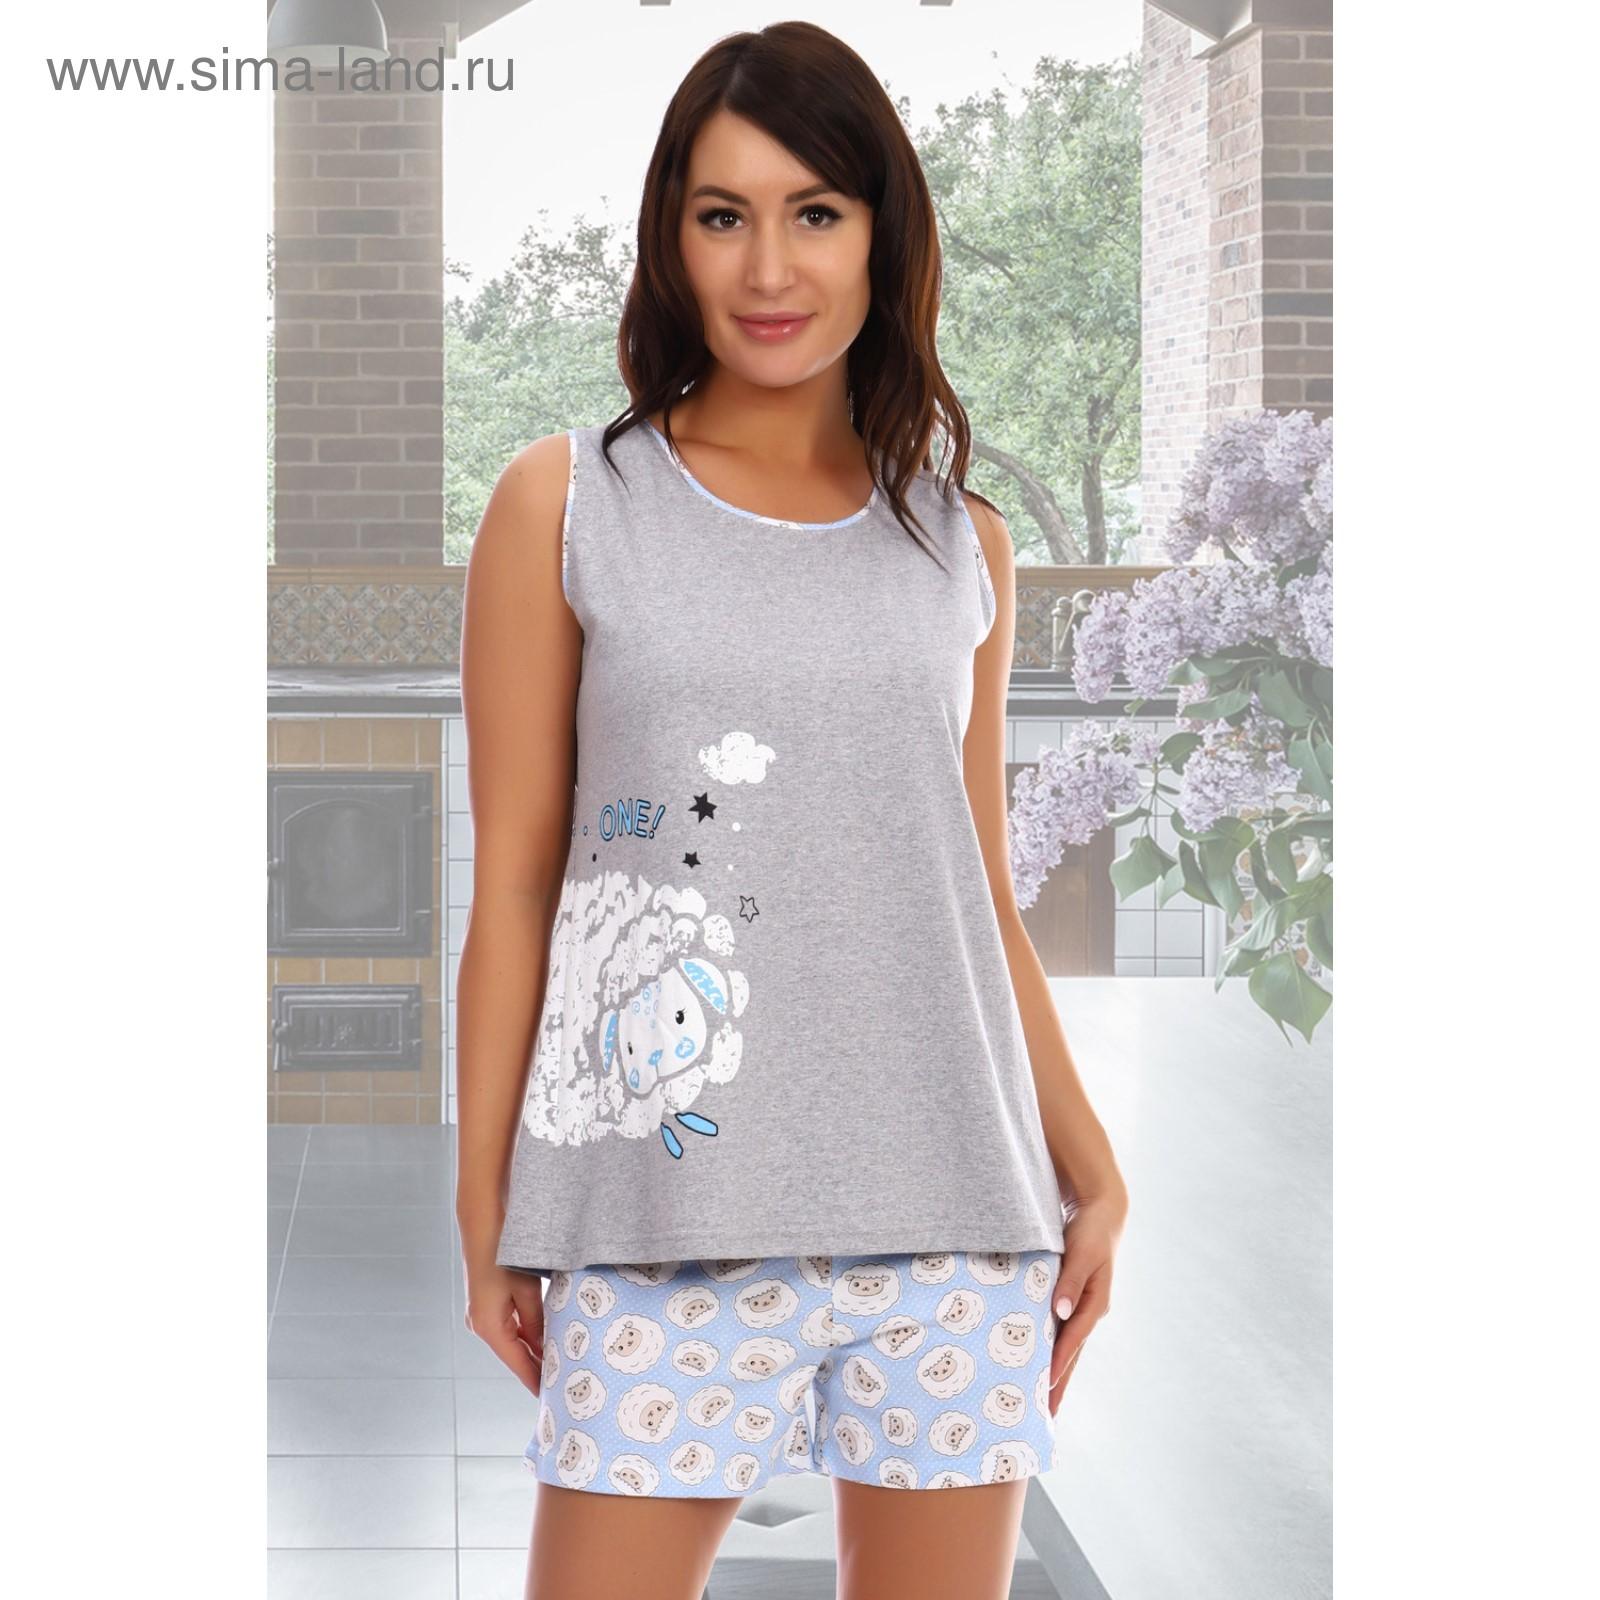 a8e4c9e05b416 Комплект женский (майка, шорты) «Кудряшки», цвет серый, размер 50 ...